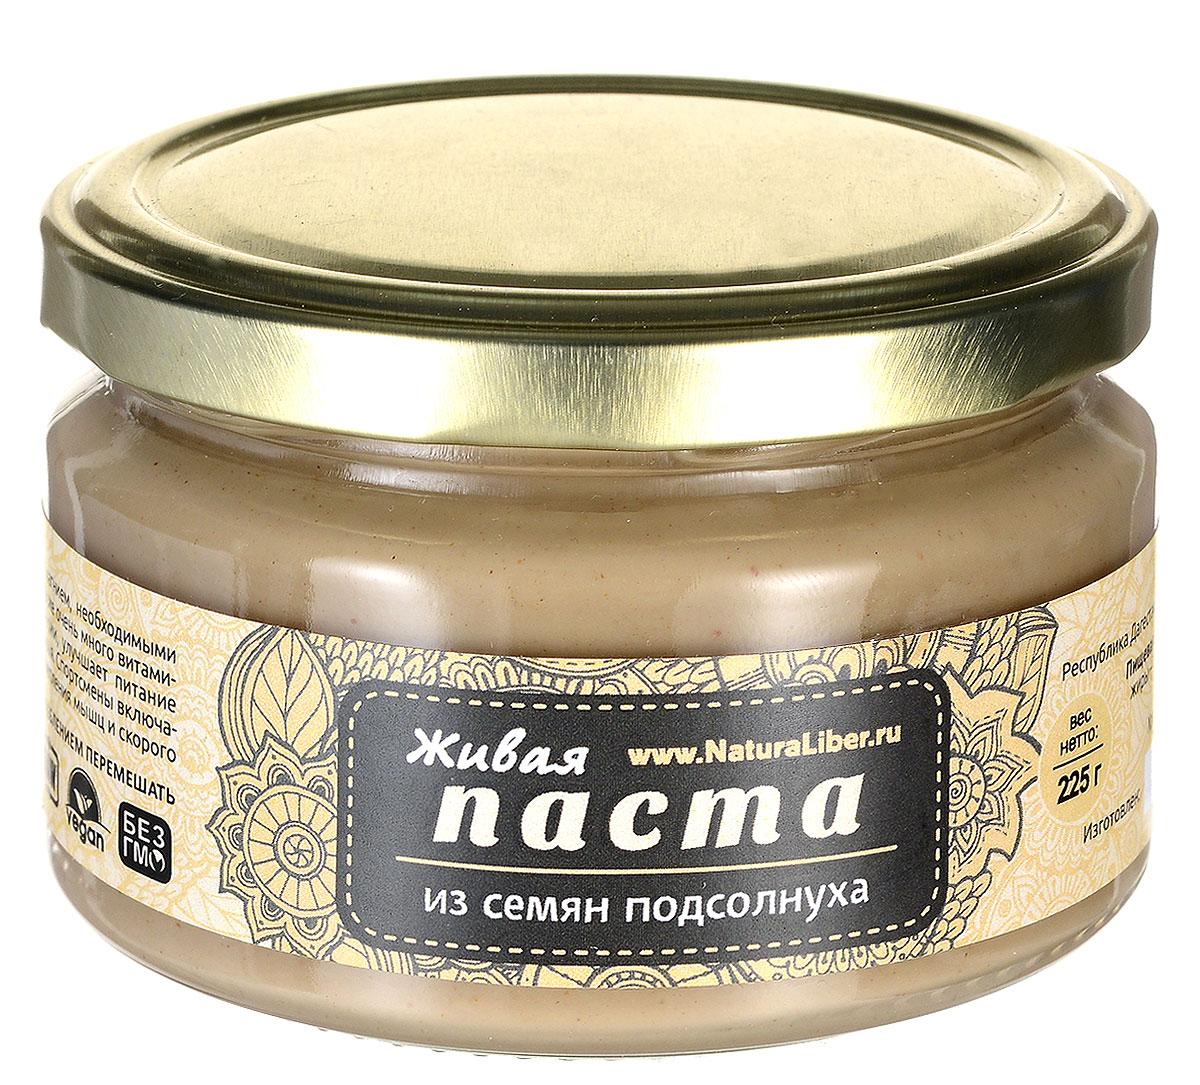 NaturaLiber паста из семян подсолнуха, 225 г loacker vanille вафли 225 г